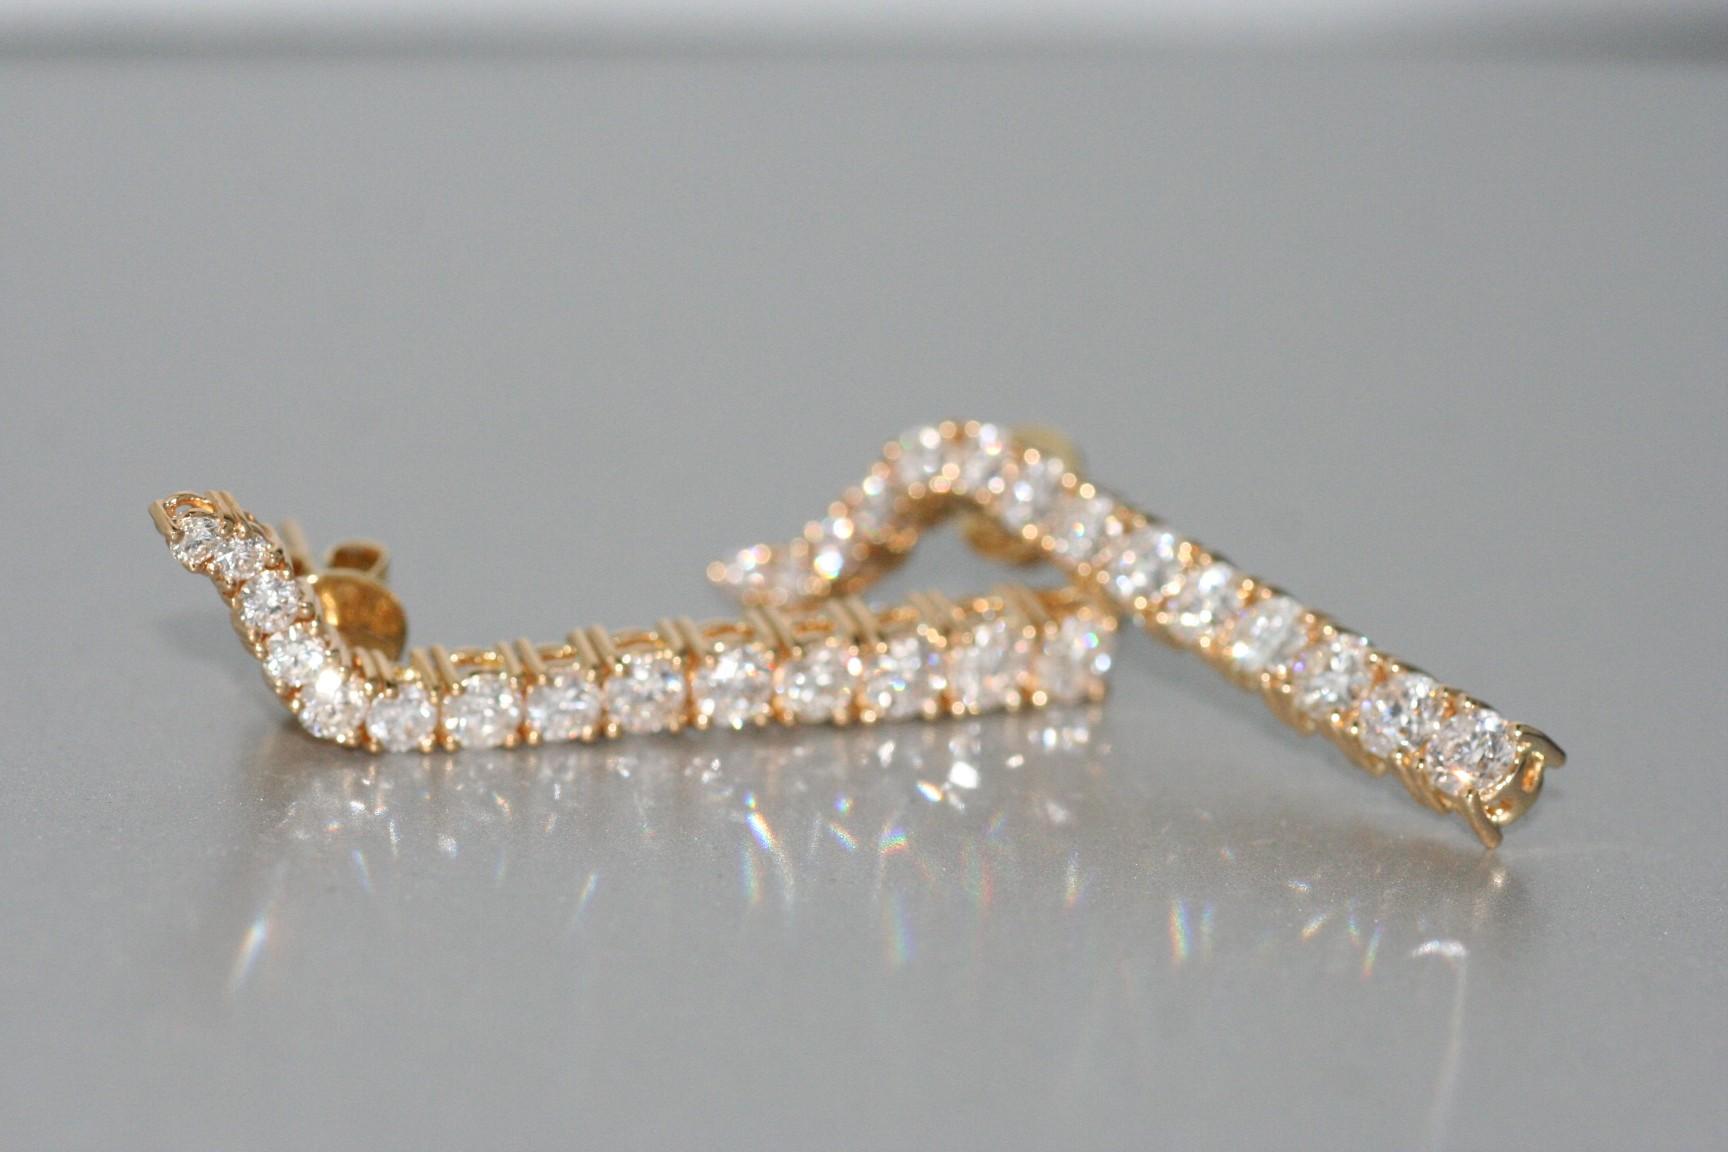 A Pair of 18 Karat Yellow Gold Diamond Earrings